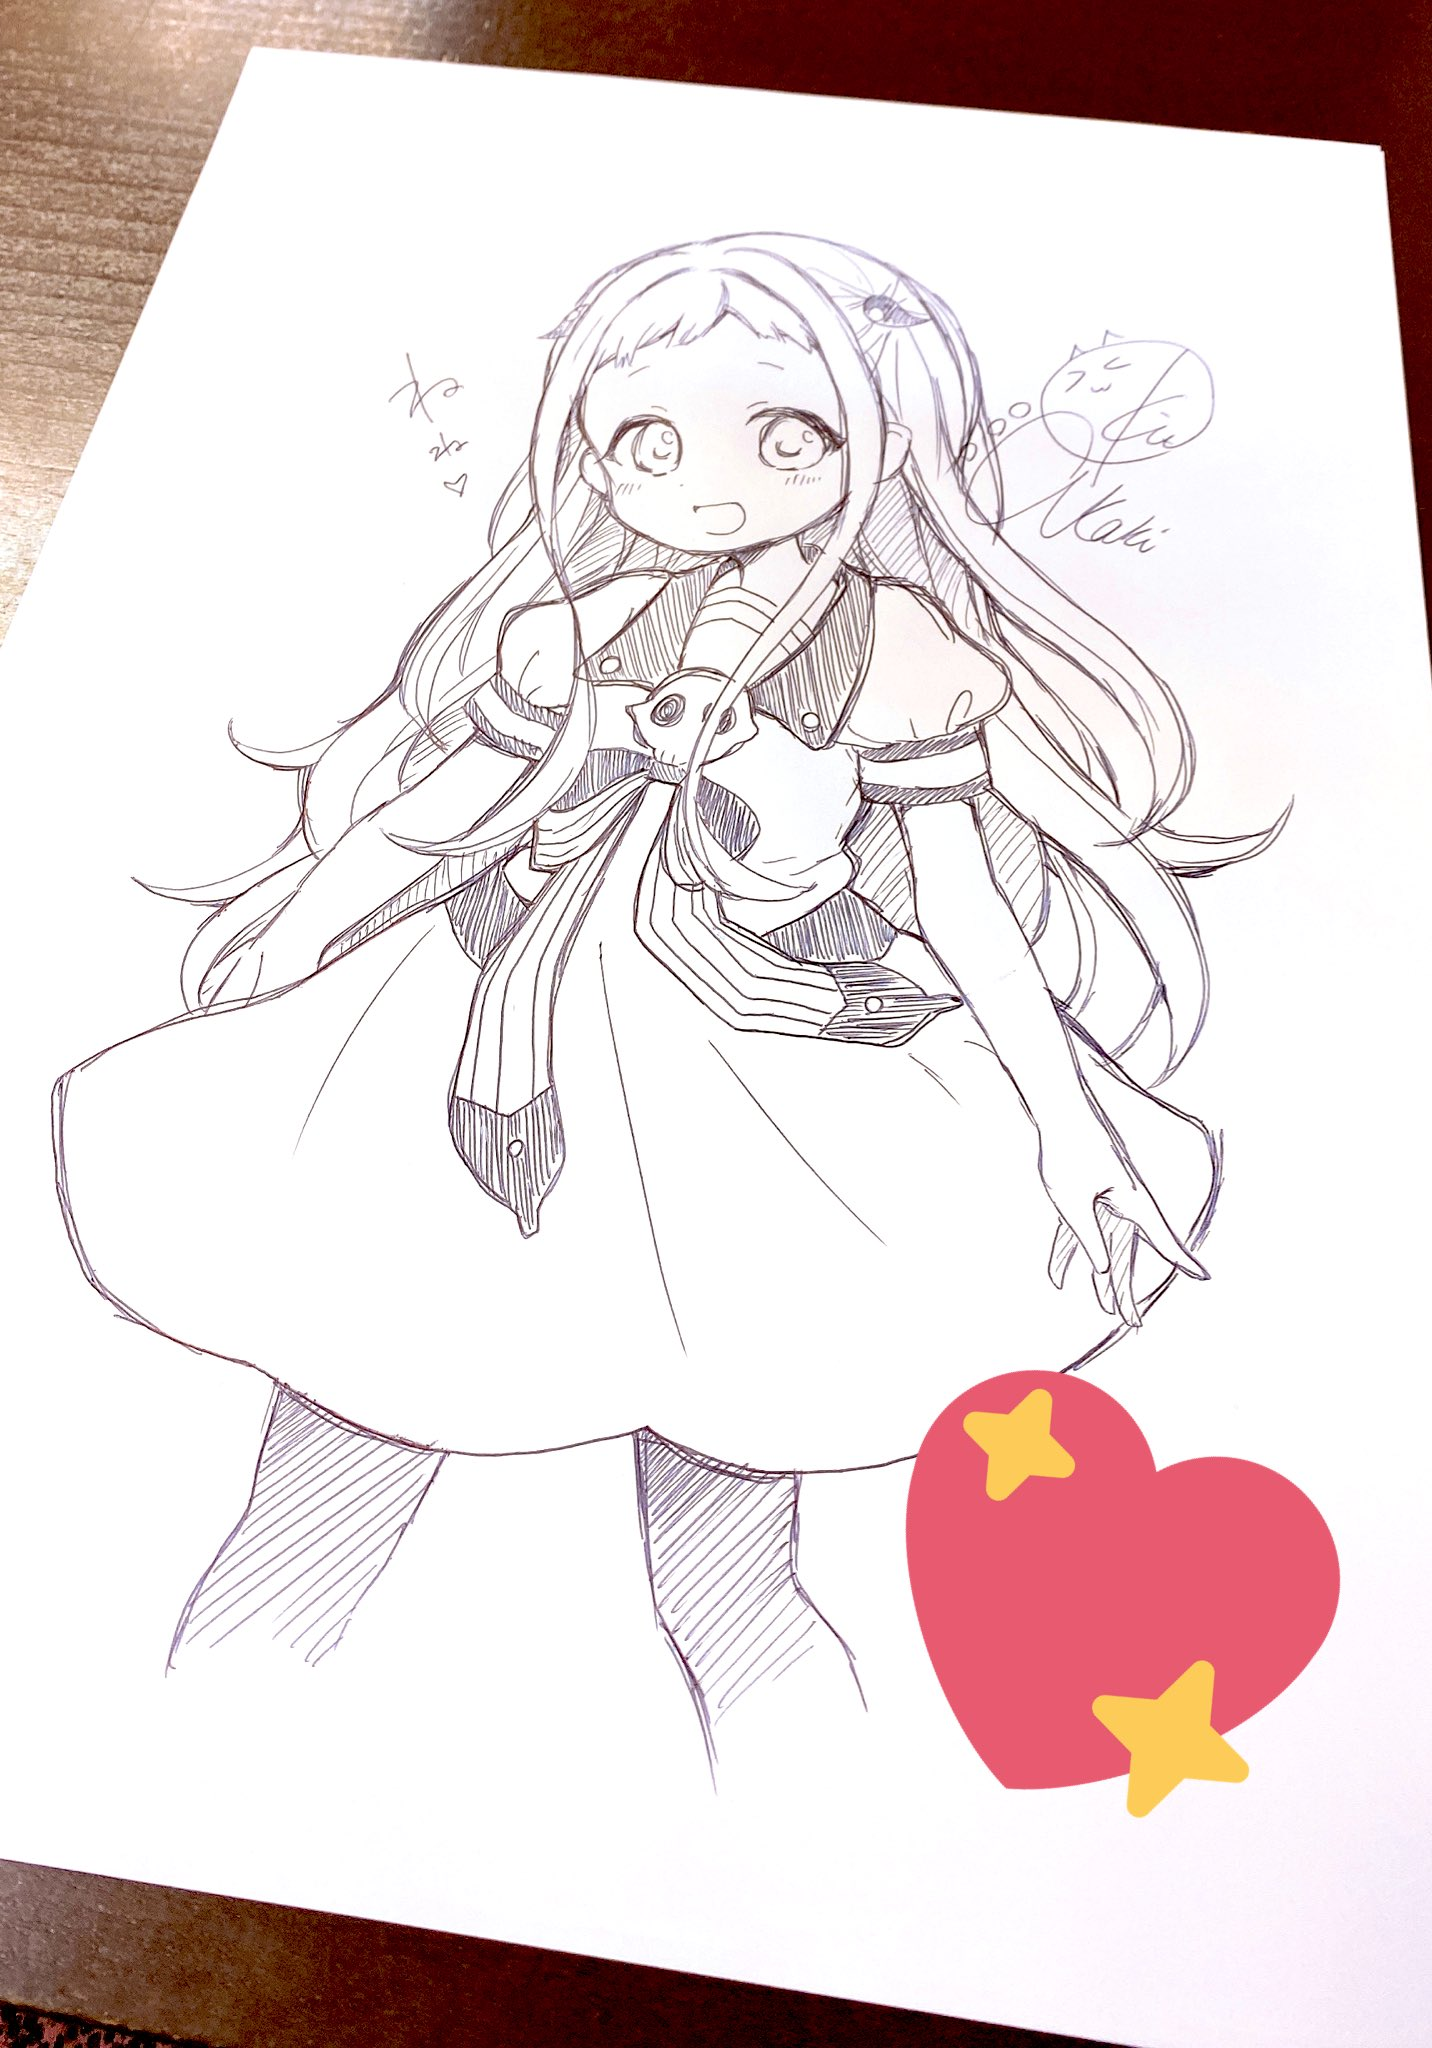 King of prism as kakeru juuouin. Akari Kitō S Drawing Of Her Character Yashiro Hanakokun